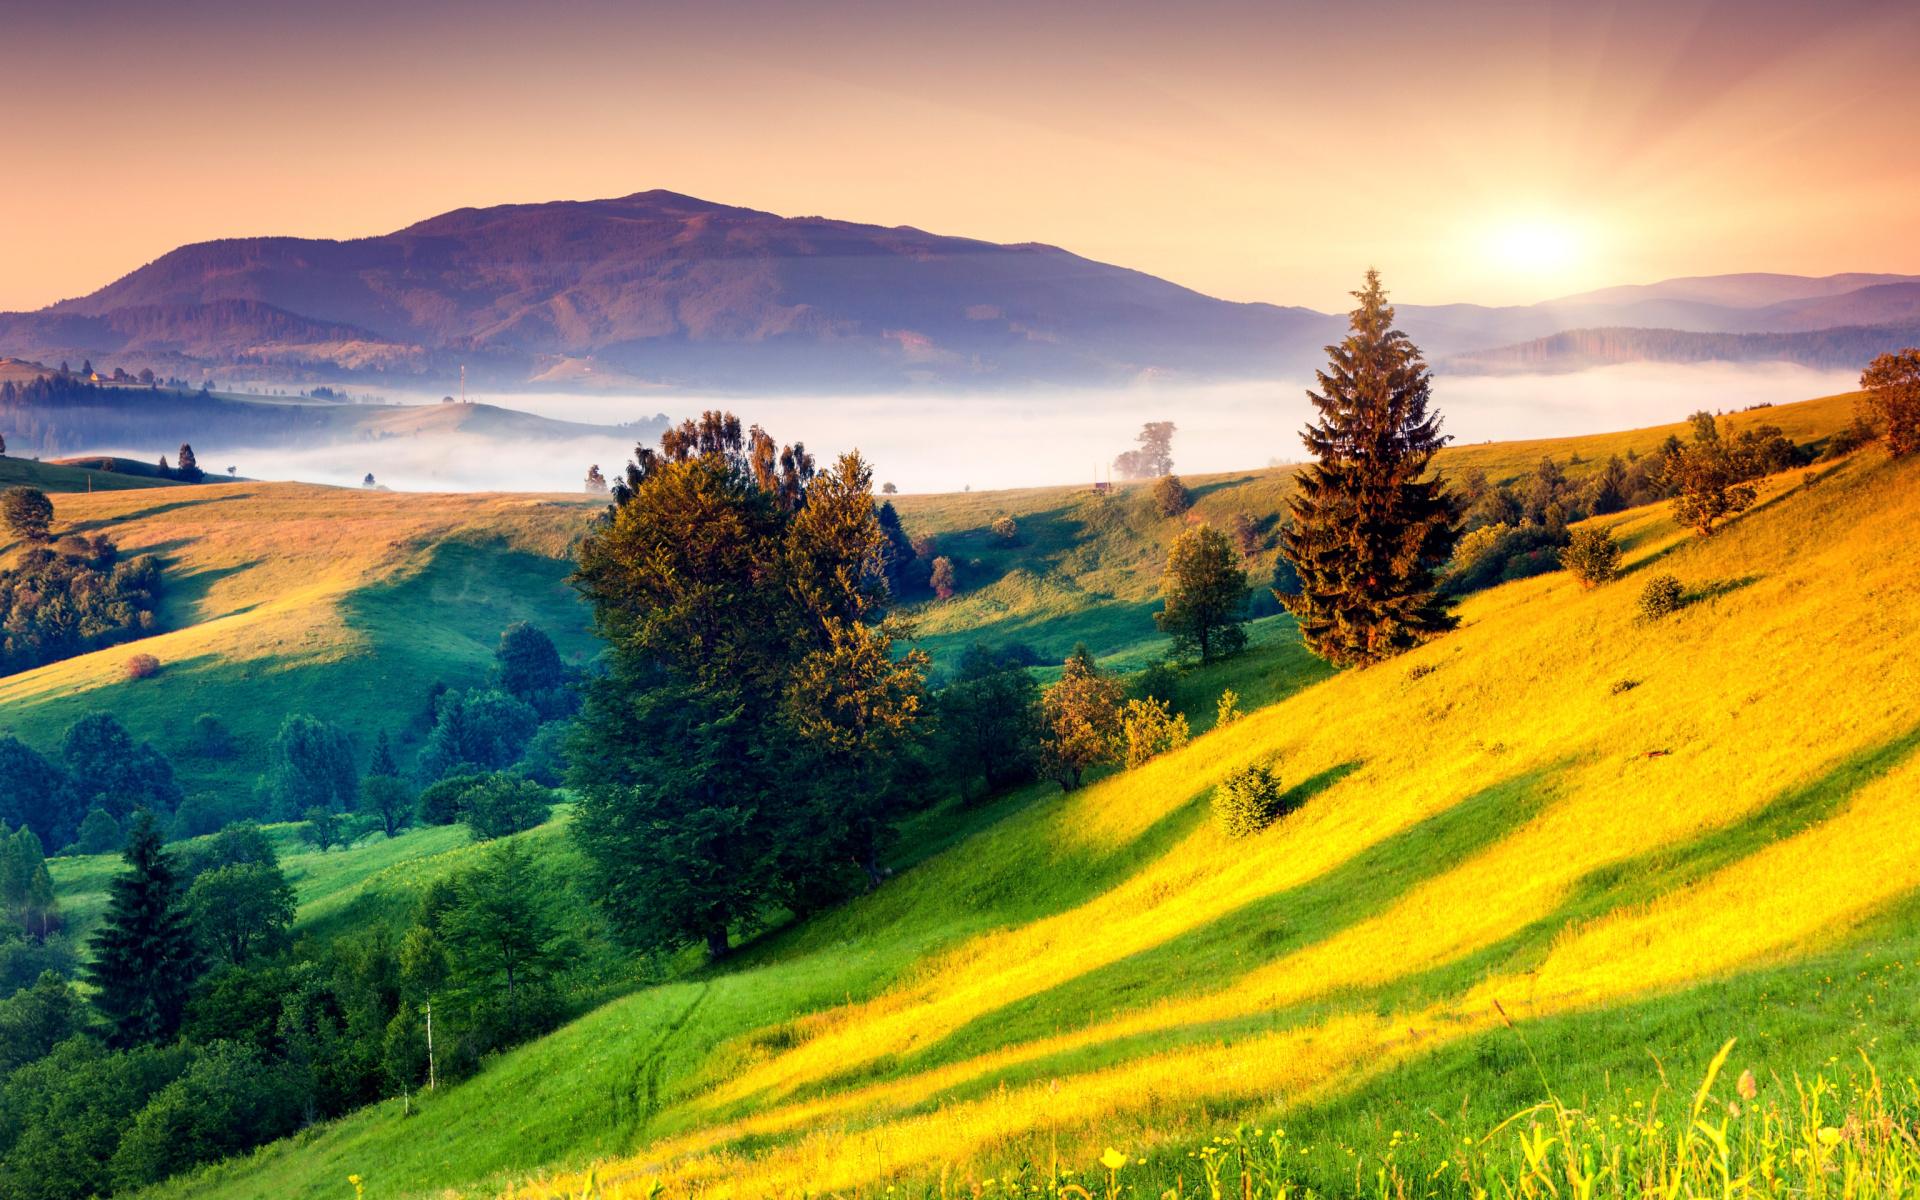 Landscape in fog fondos de pantalla gratis para for Imagenes full hd para fondo de pantalla